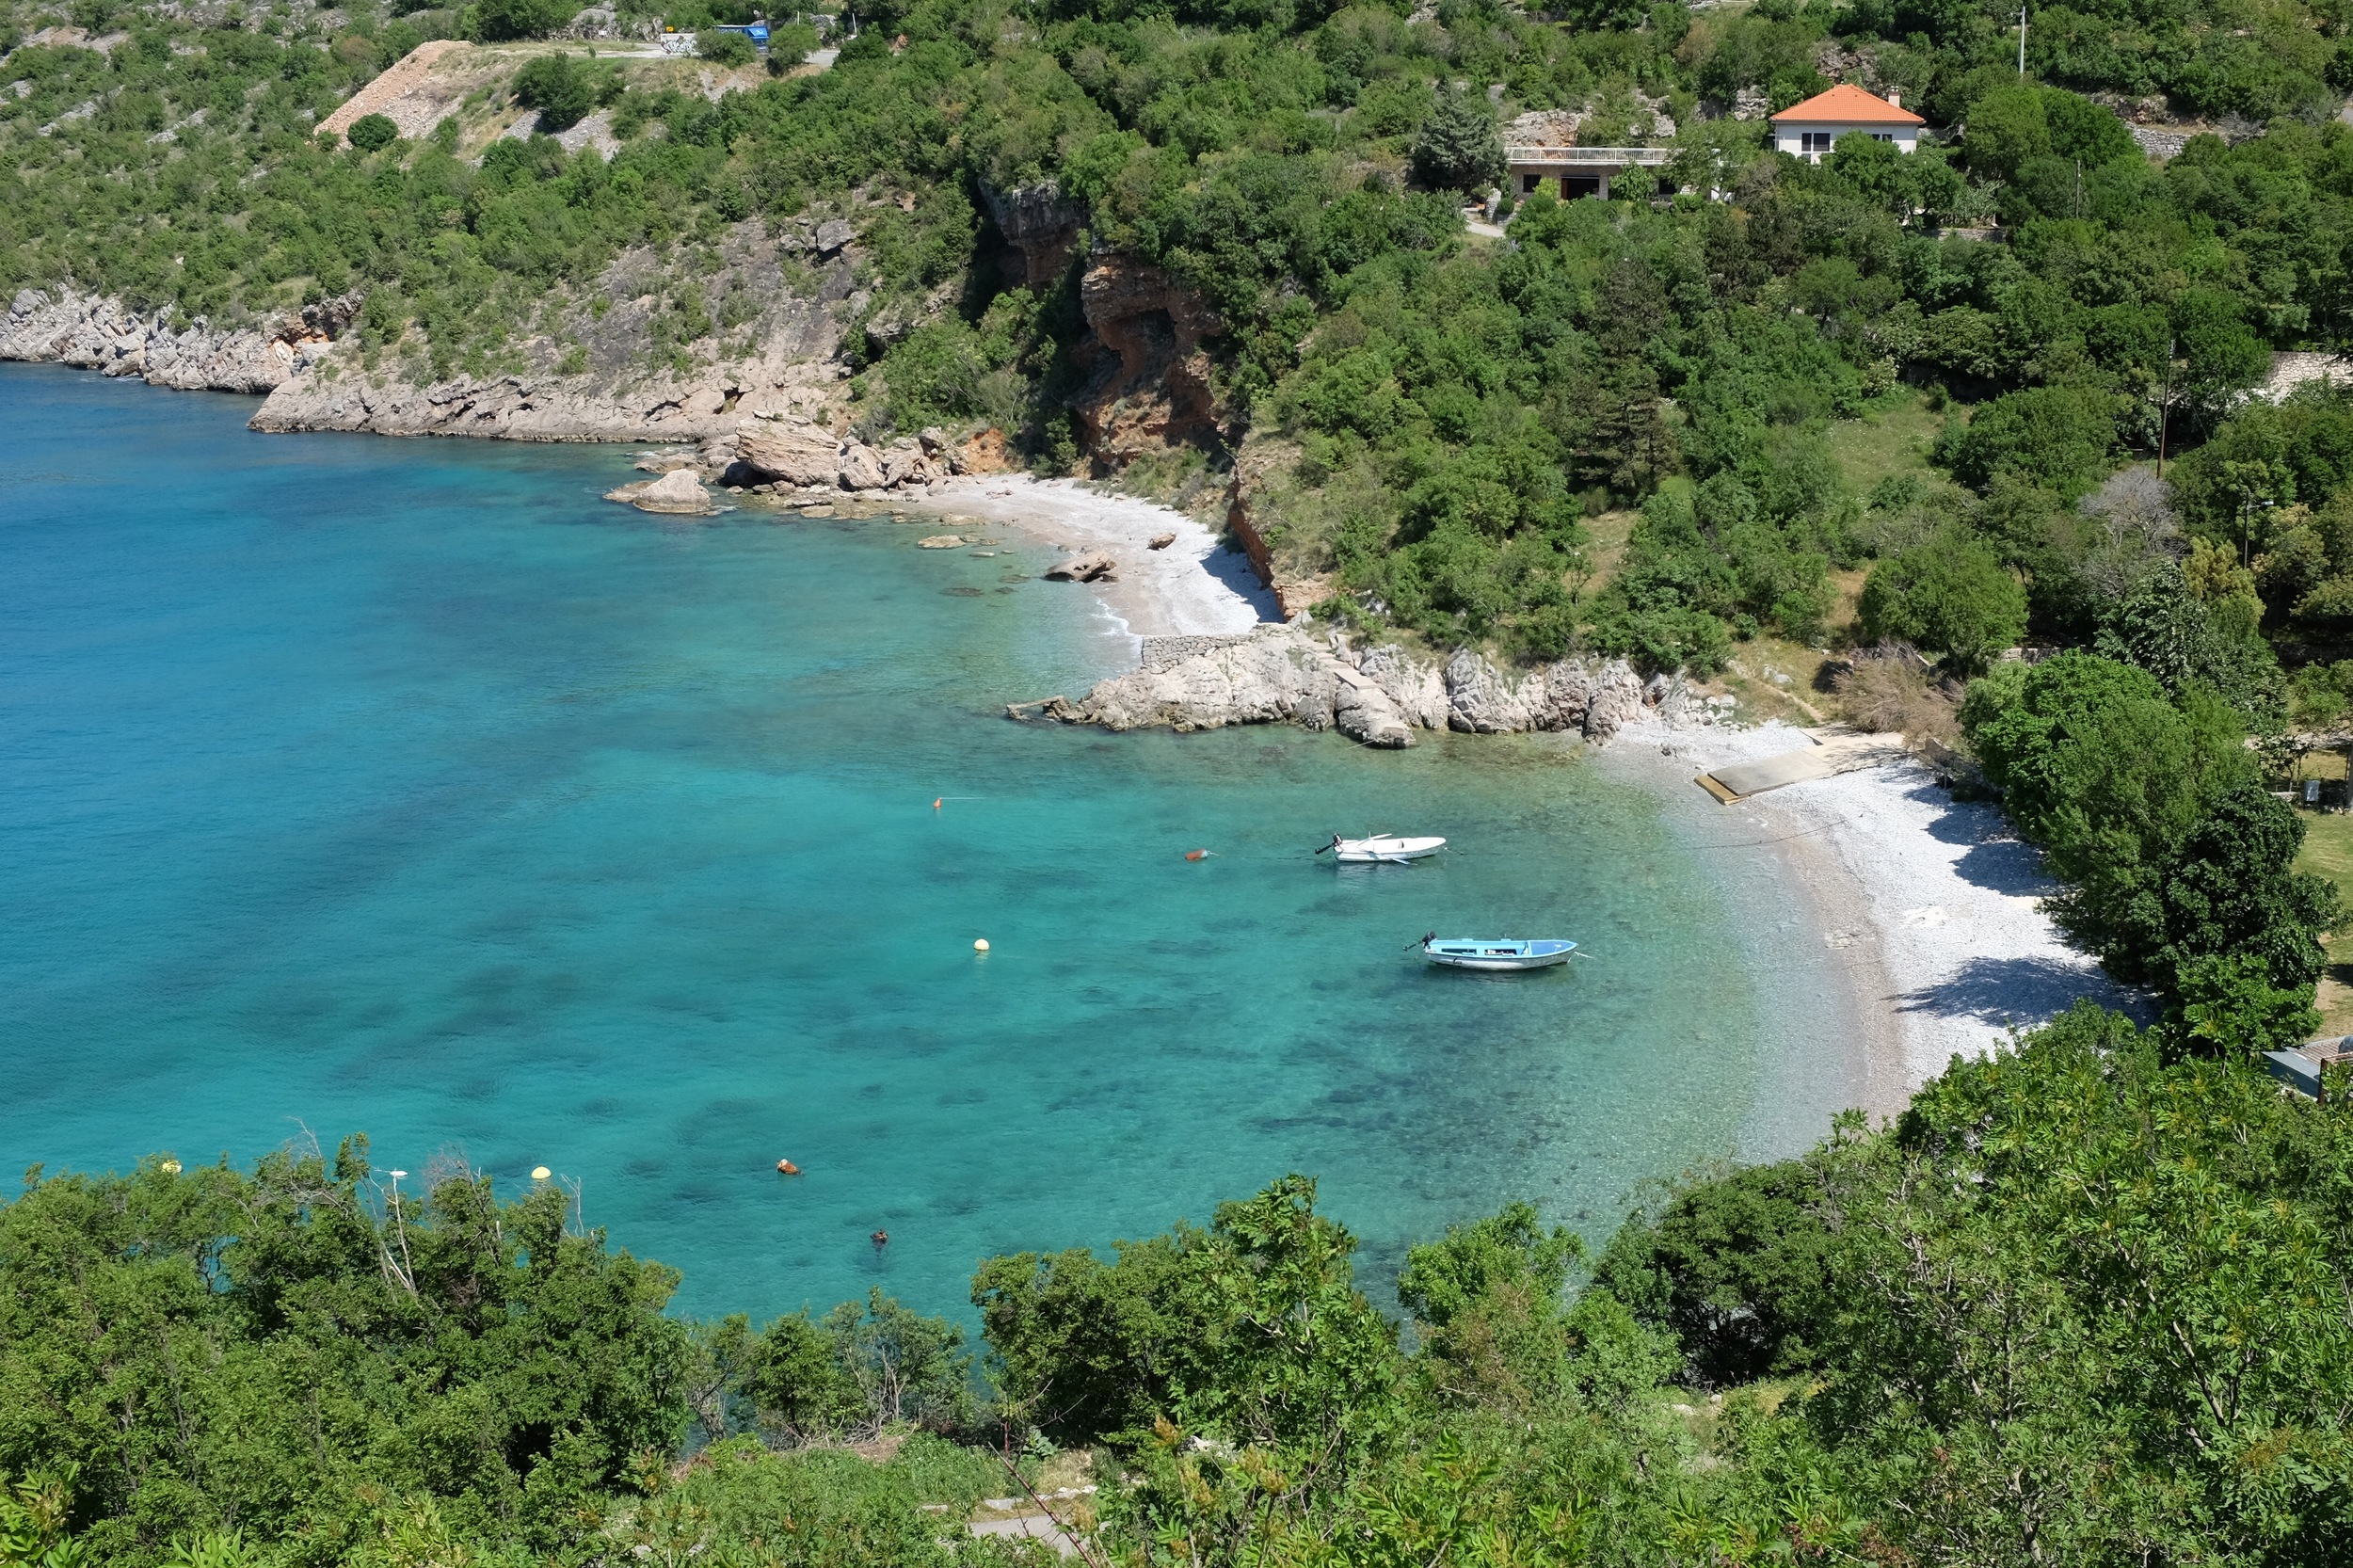 A hidden bay in Croatia